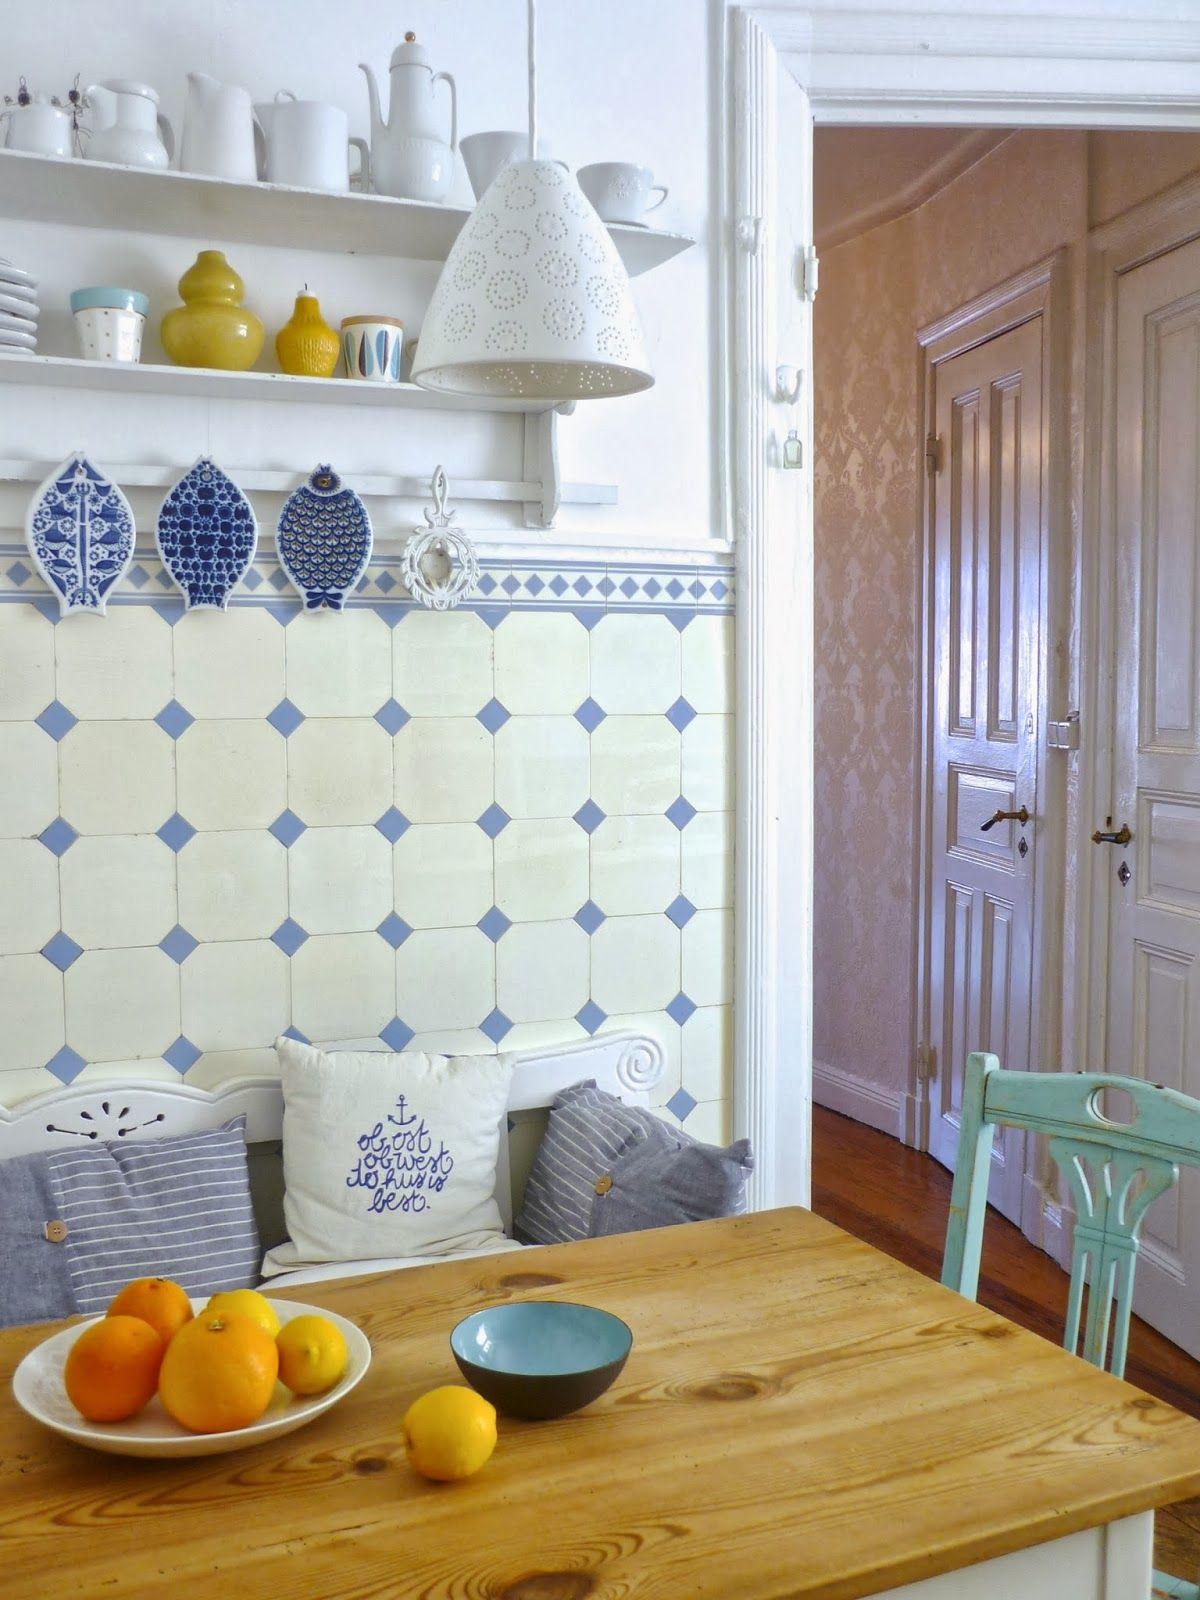 mimameise dawanda wohnparade home inspiration. Black Bedroom Furniture Sets. Home Design Ideas